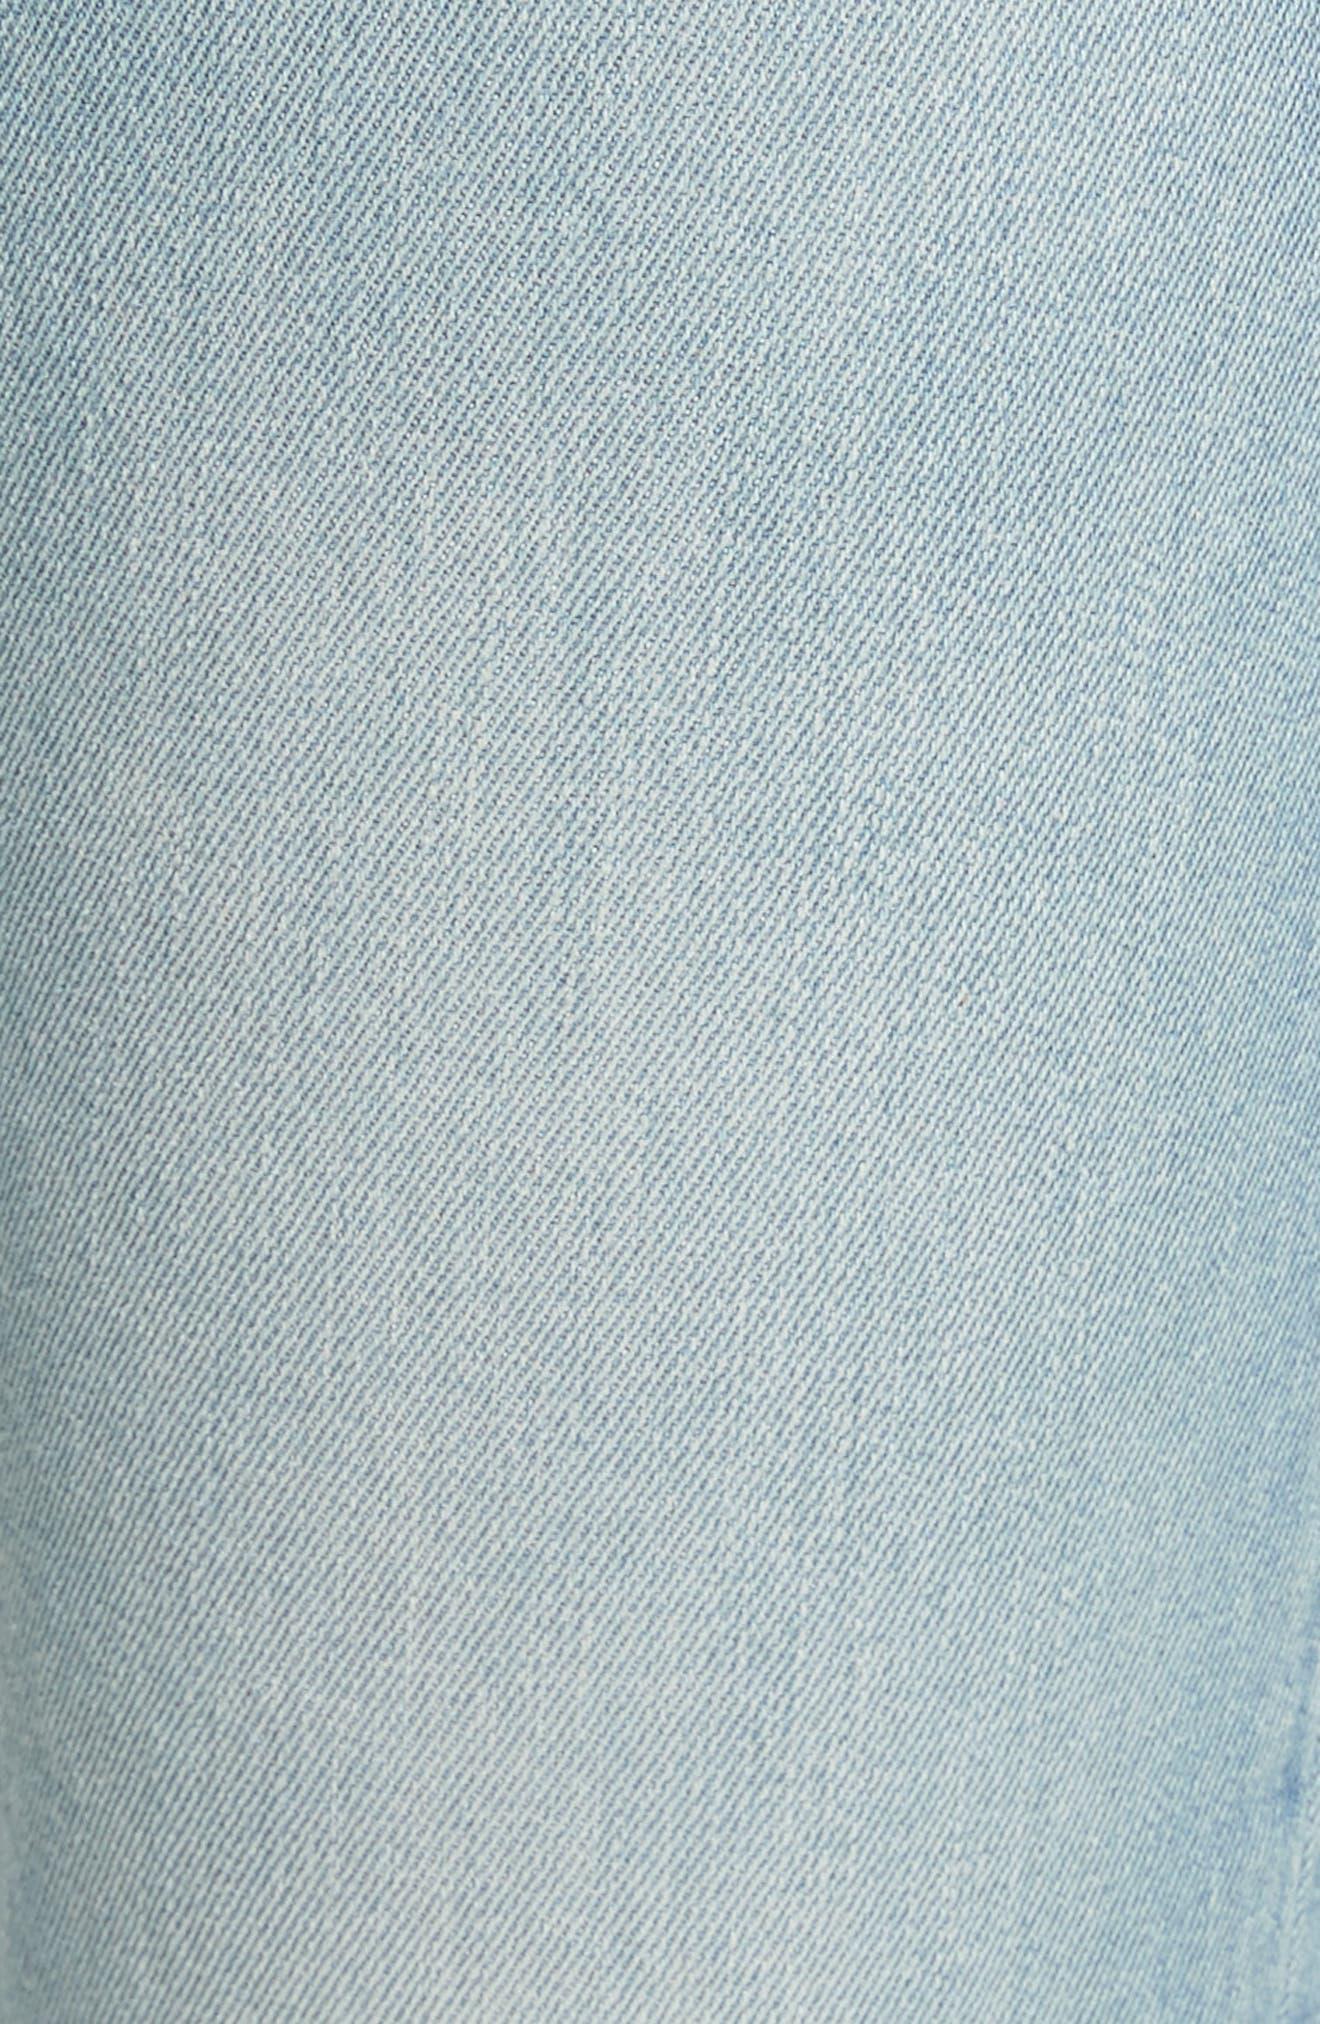 Le Boy High Waist Raw Hem Jeans,                             Alternate thumbnail 5, color,                             Pamder End